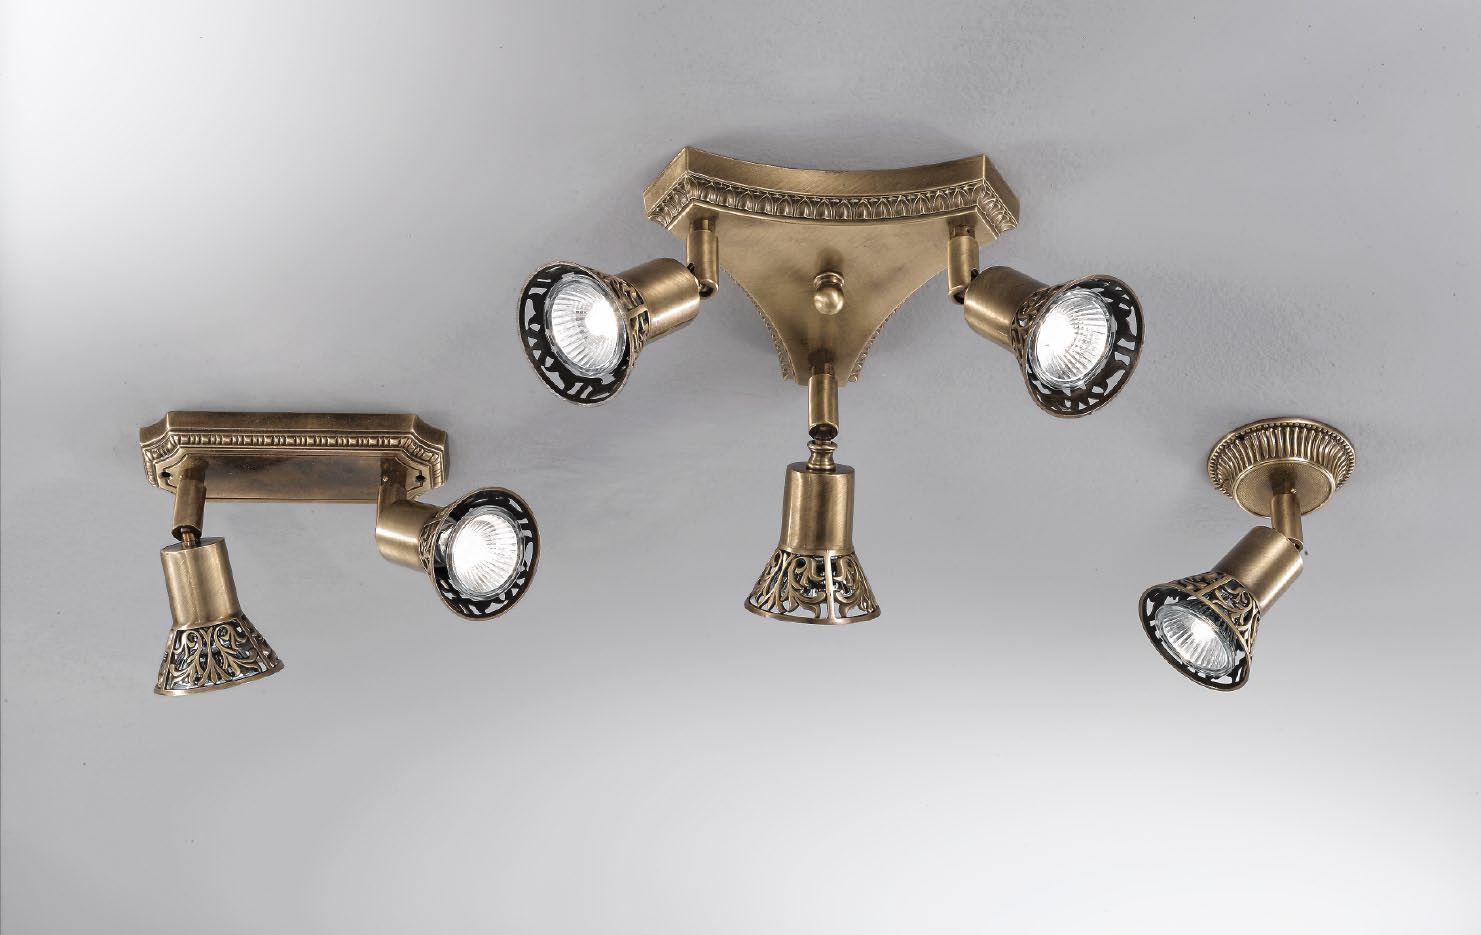 Nervilamp Светильники 10